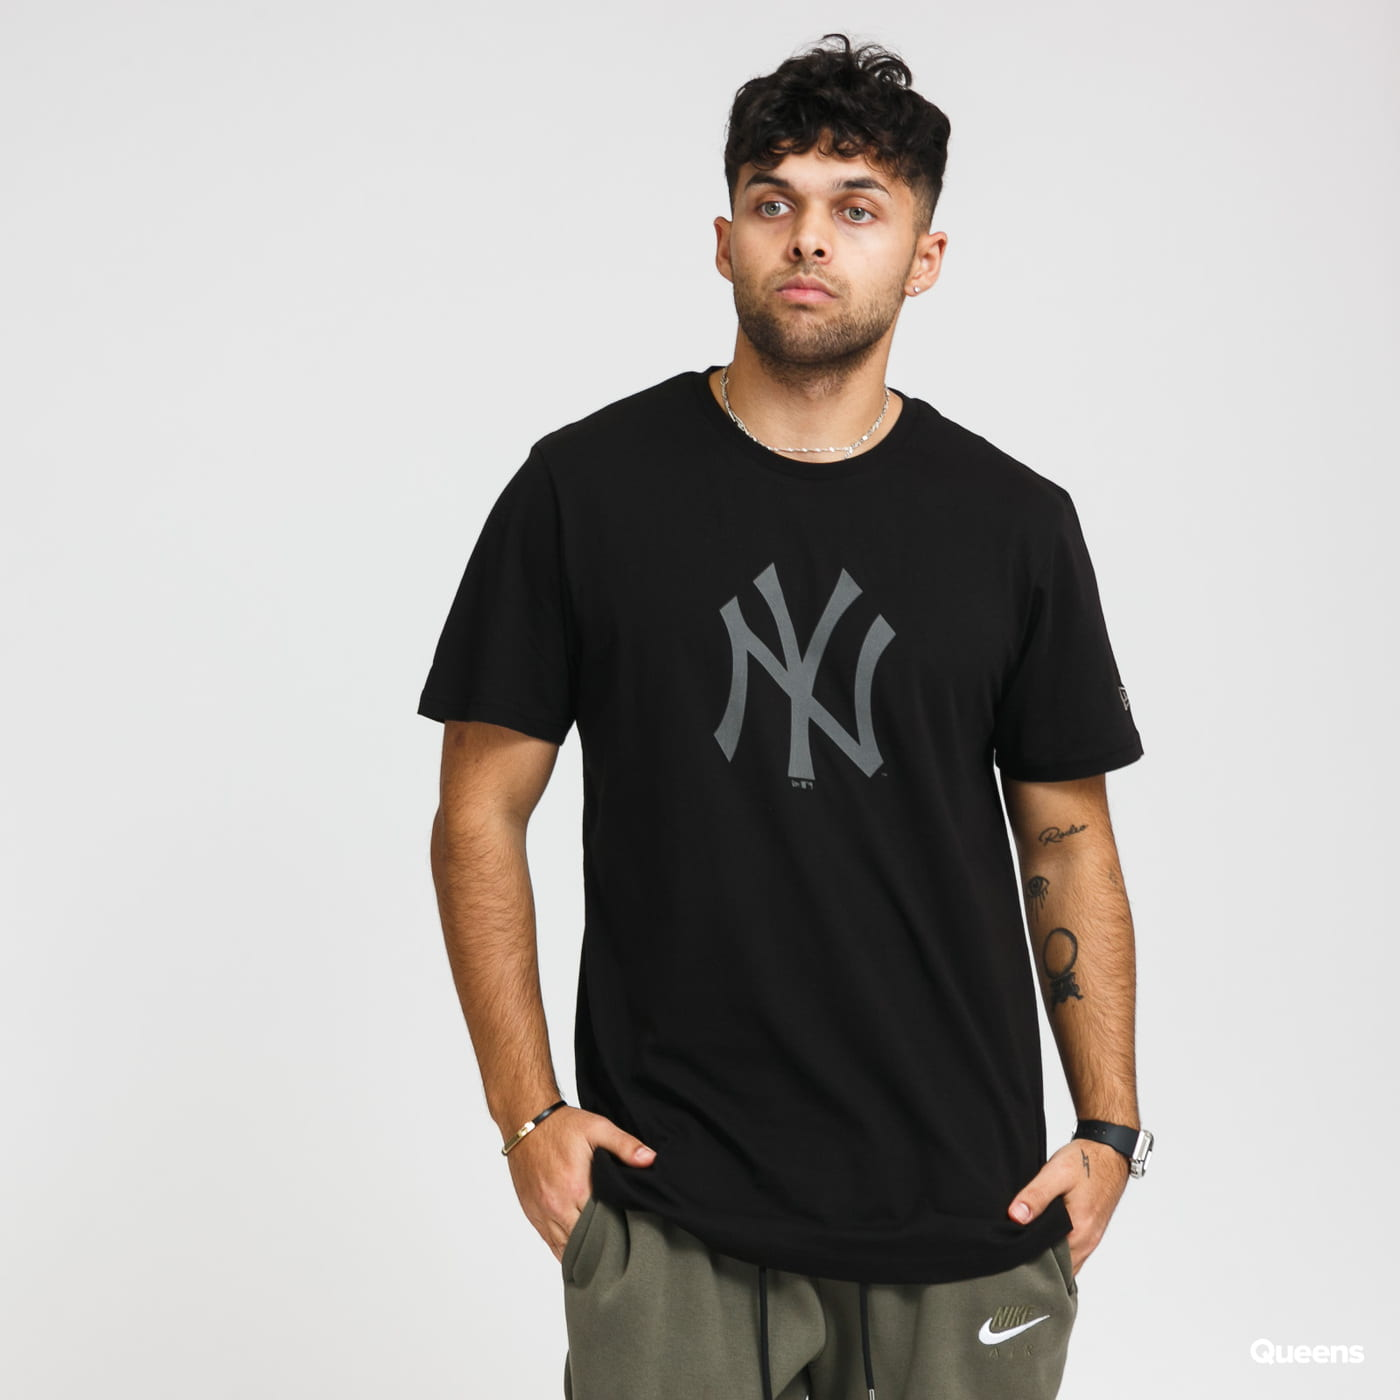 New Era MLB Reflective Print Tee NY černé